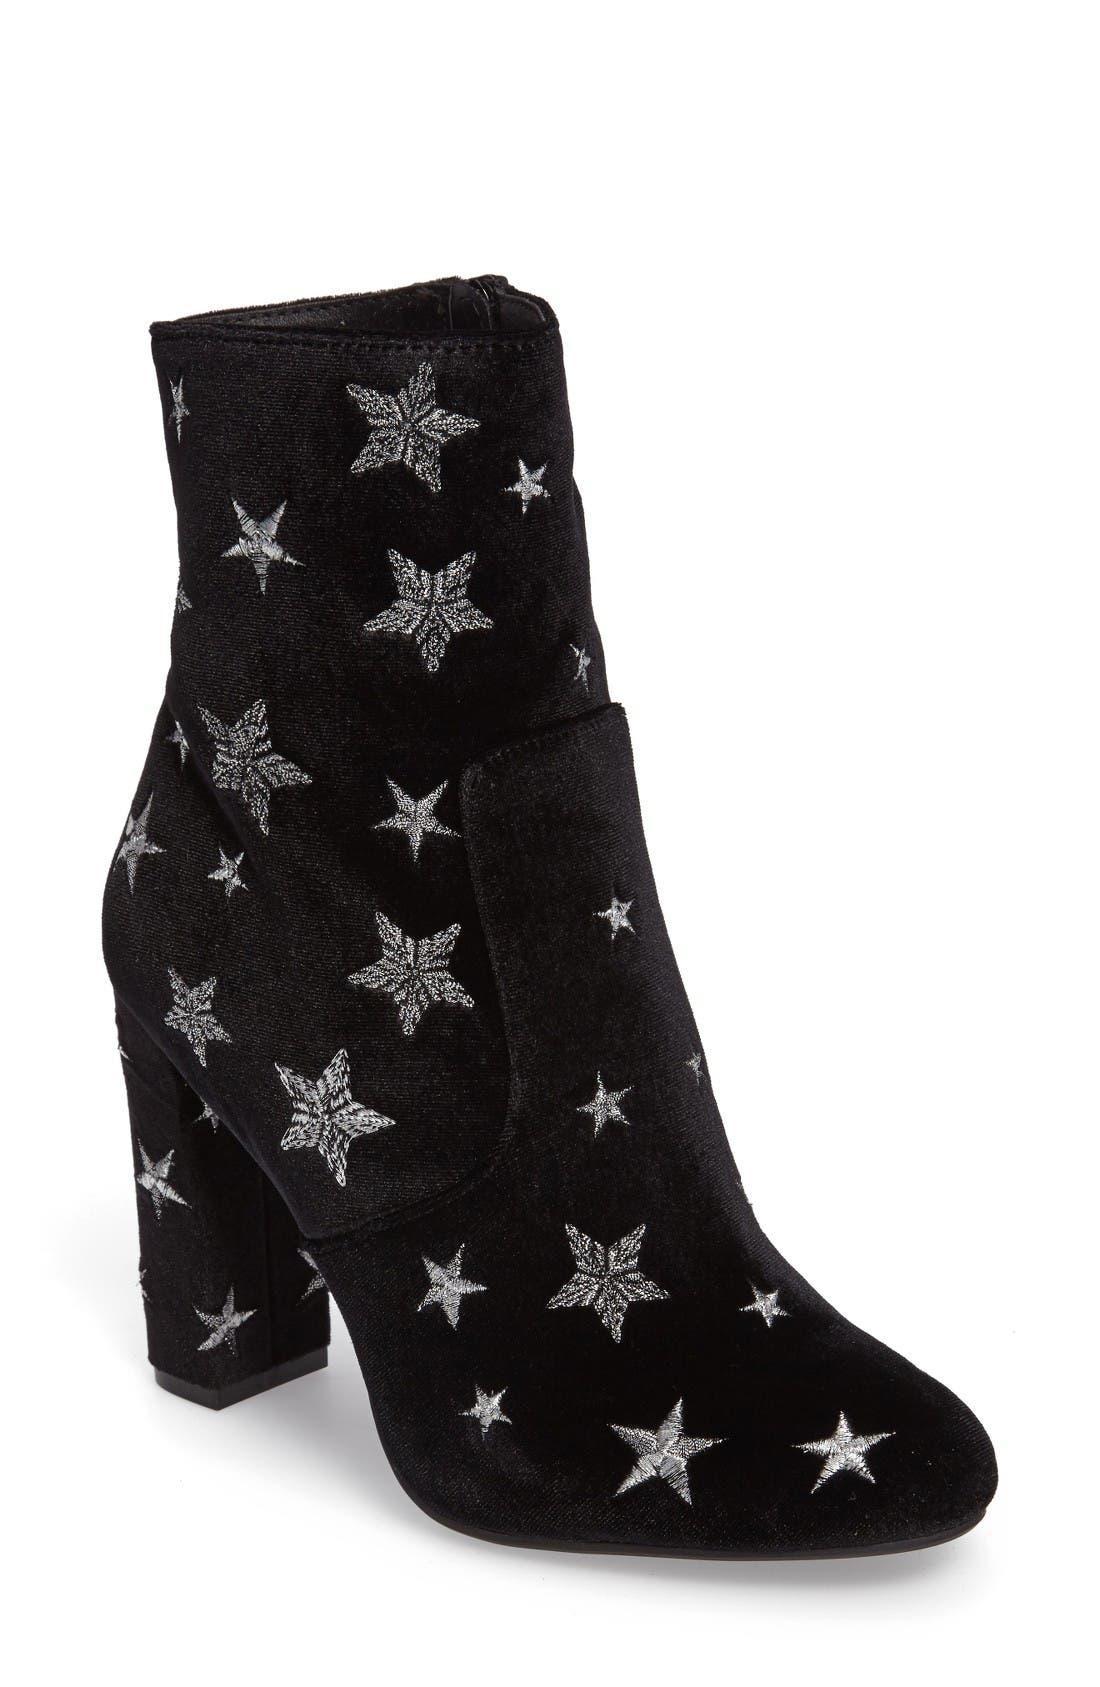 Alternate Image 1 Selected - Steve Madden Edit Embroidered Star Bootie (Women)